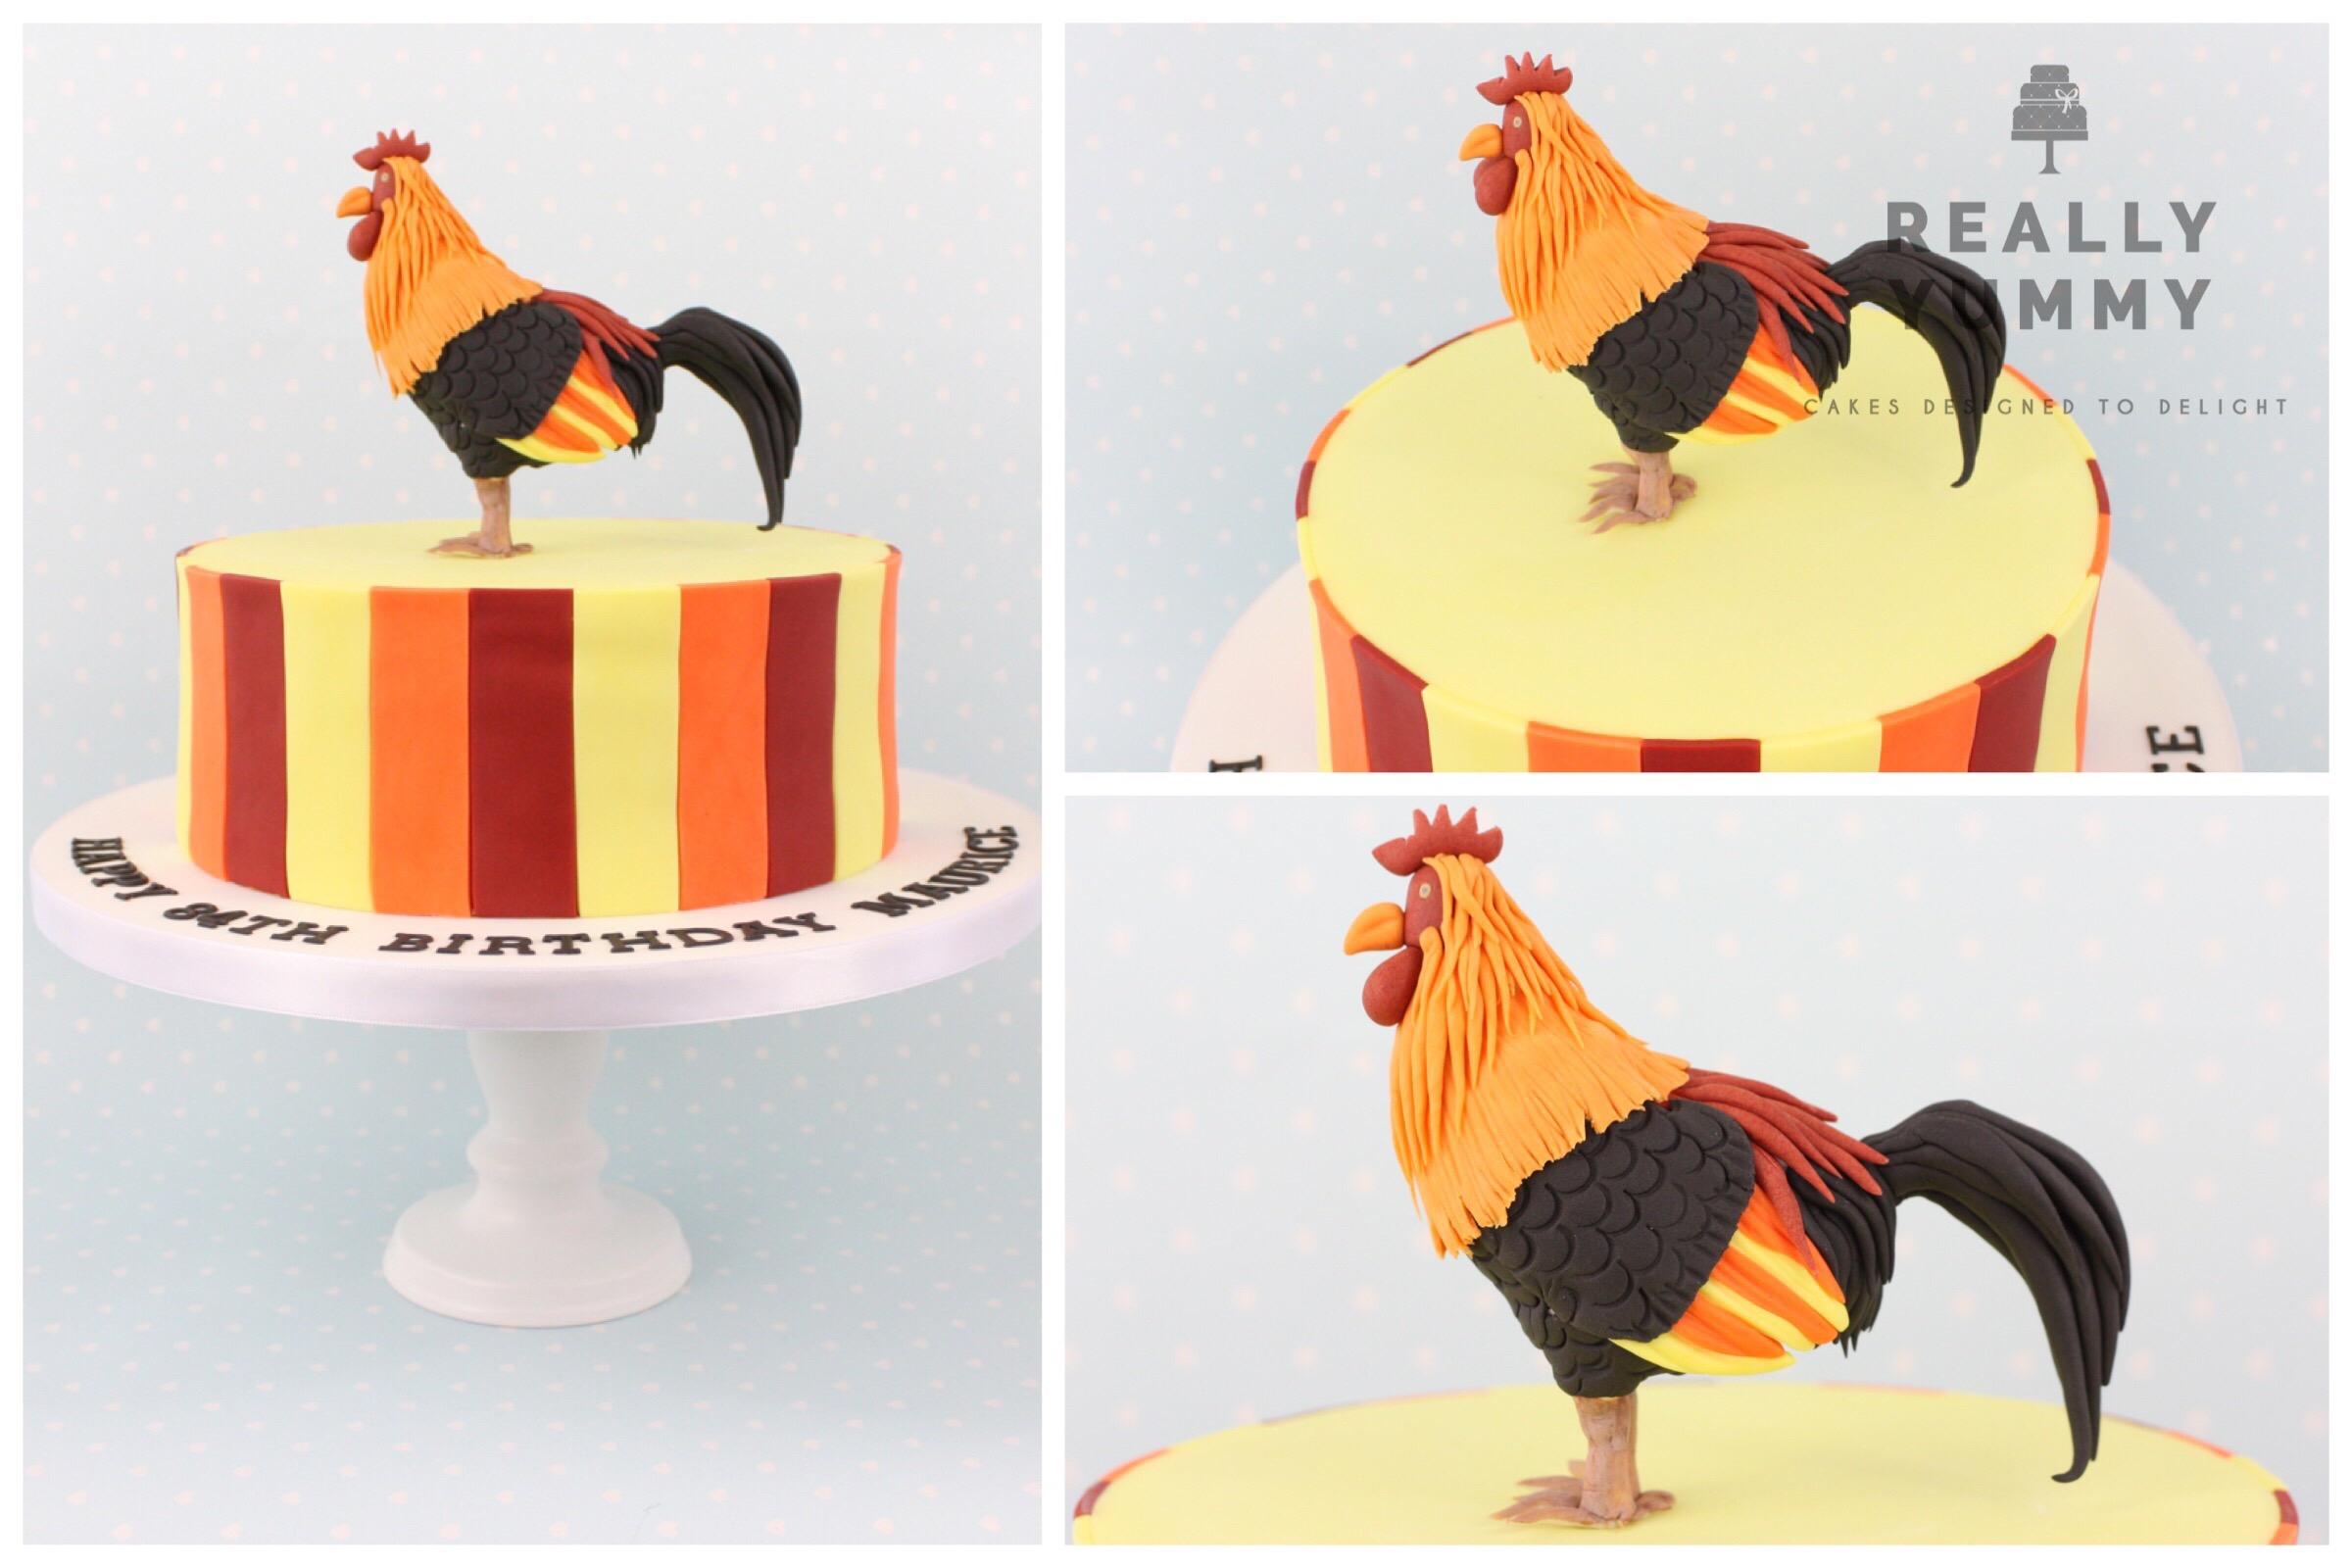 Cockerel rooster cake